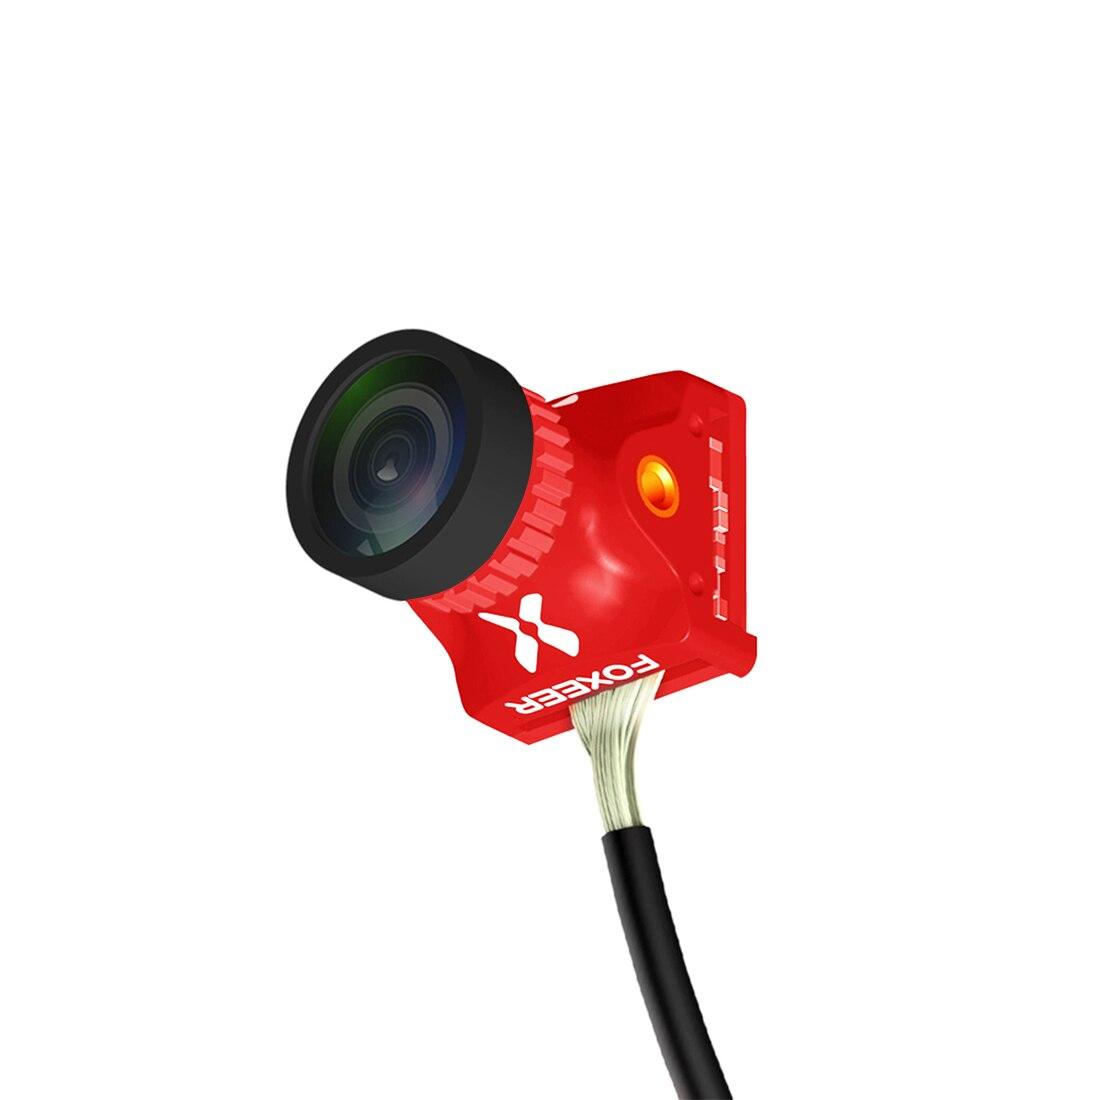 Foxeer Digisight HP 720P Digital/Analog